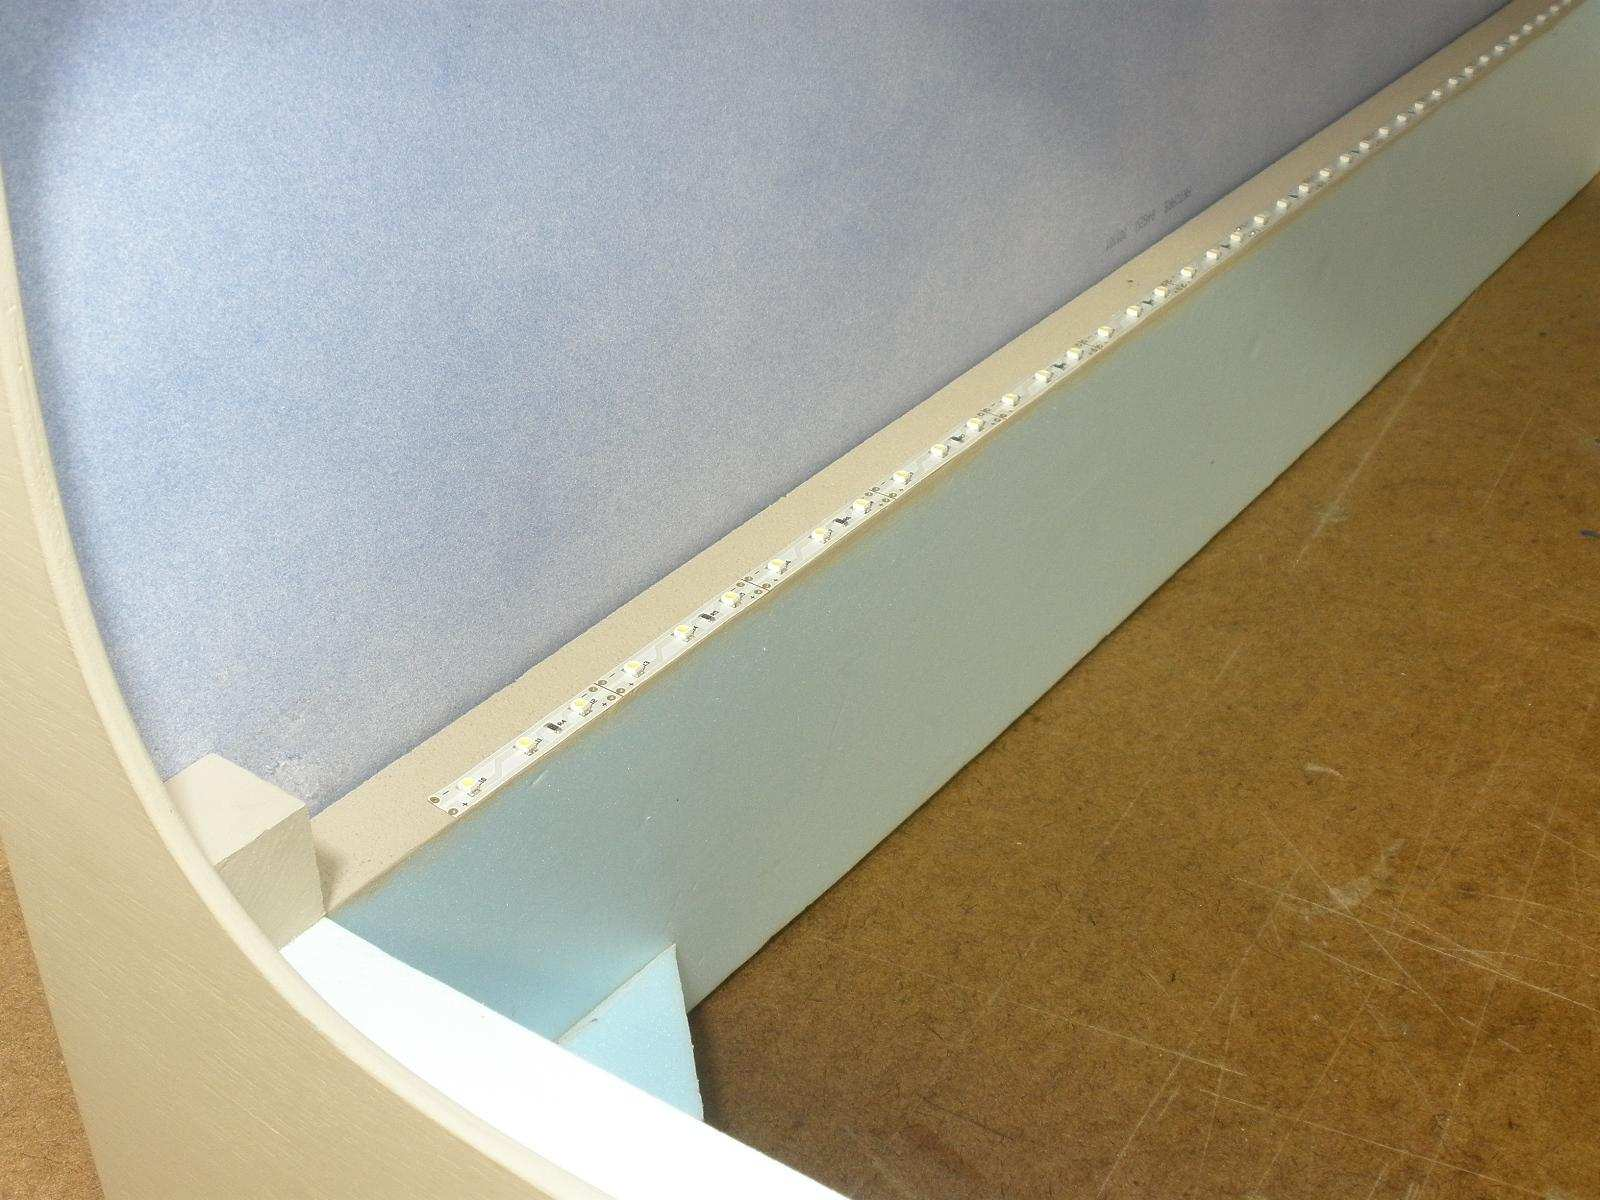 The 'horizon' LED strip along the back